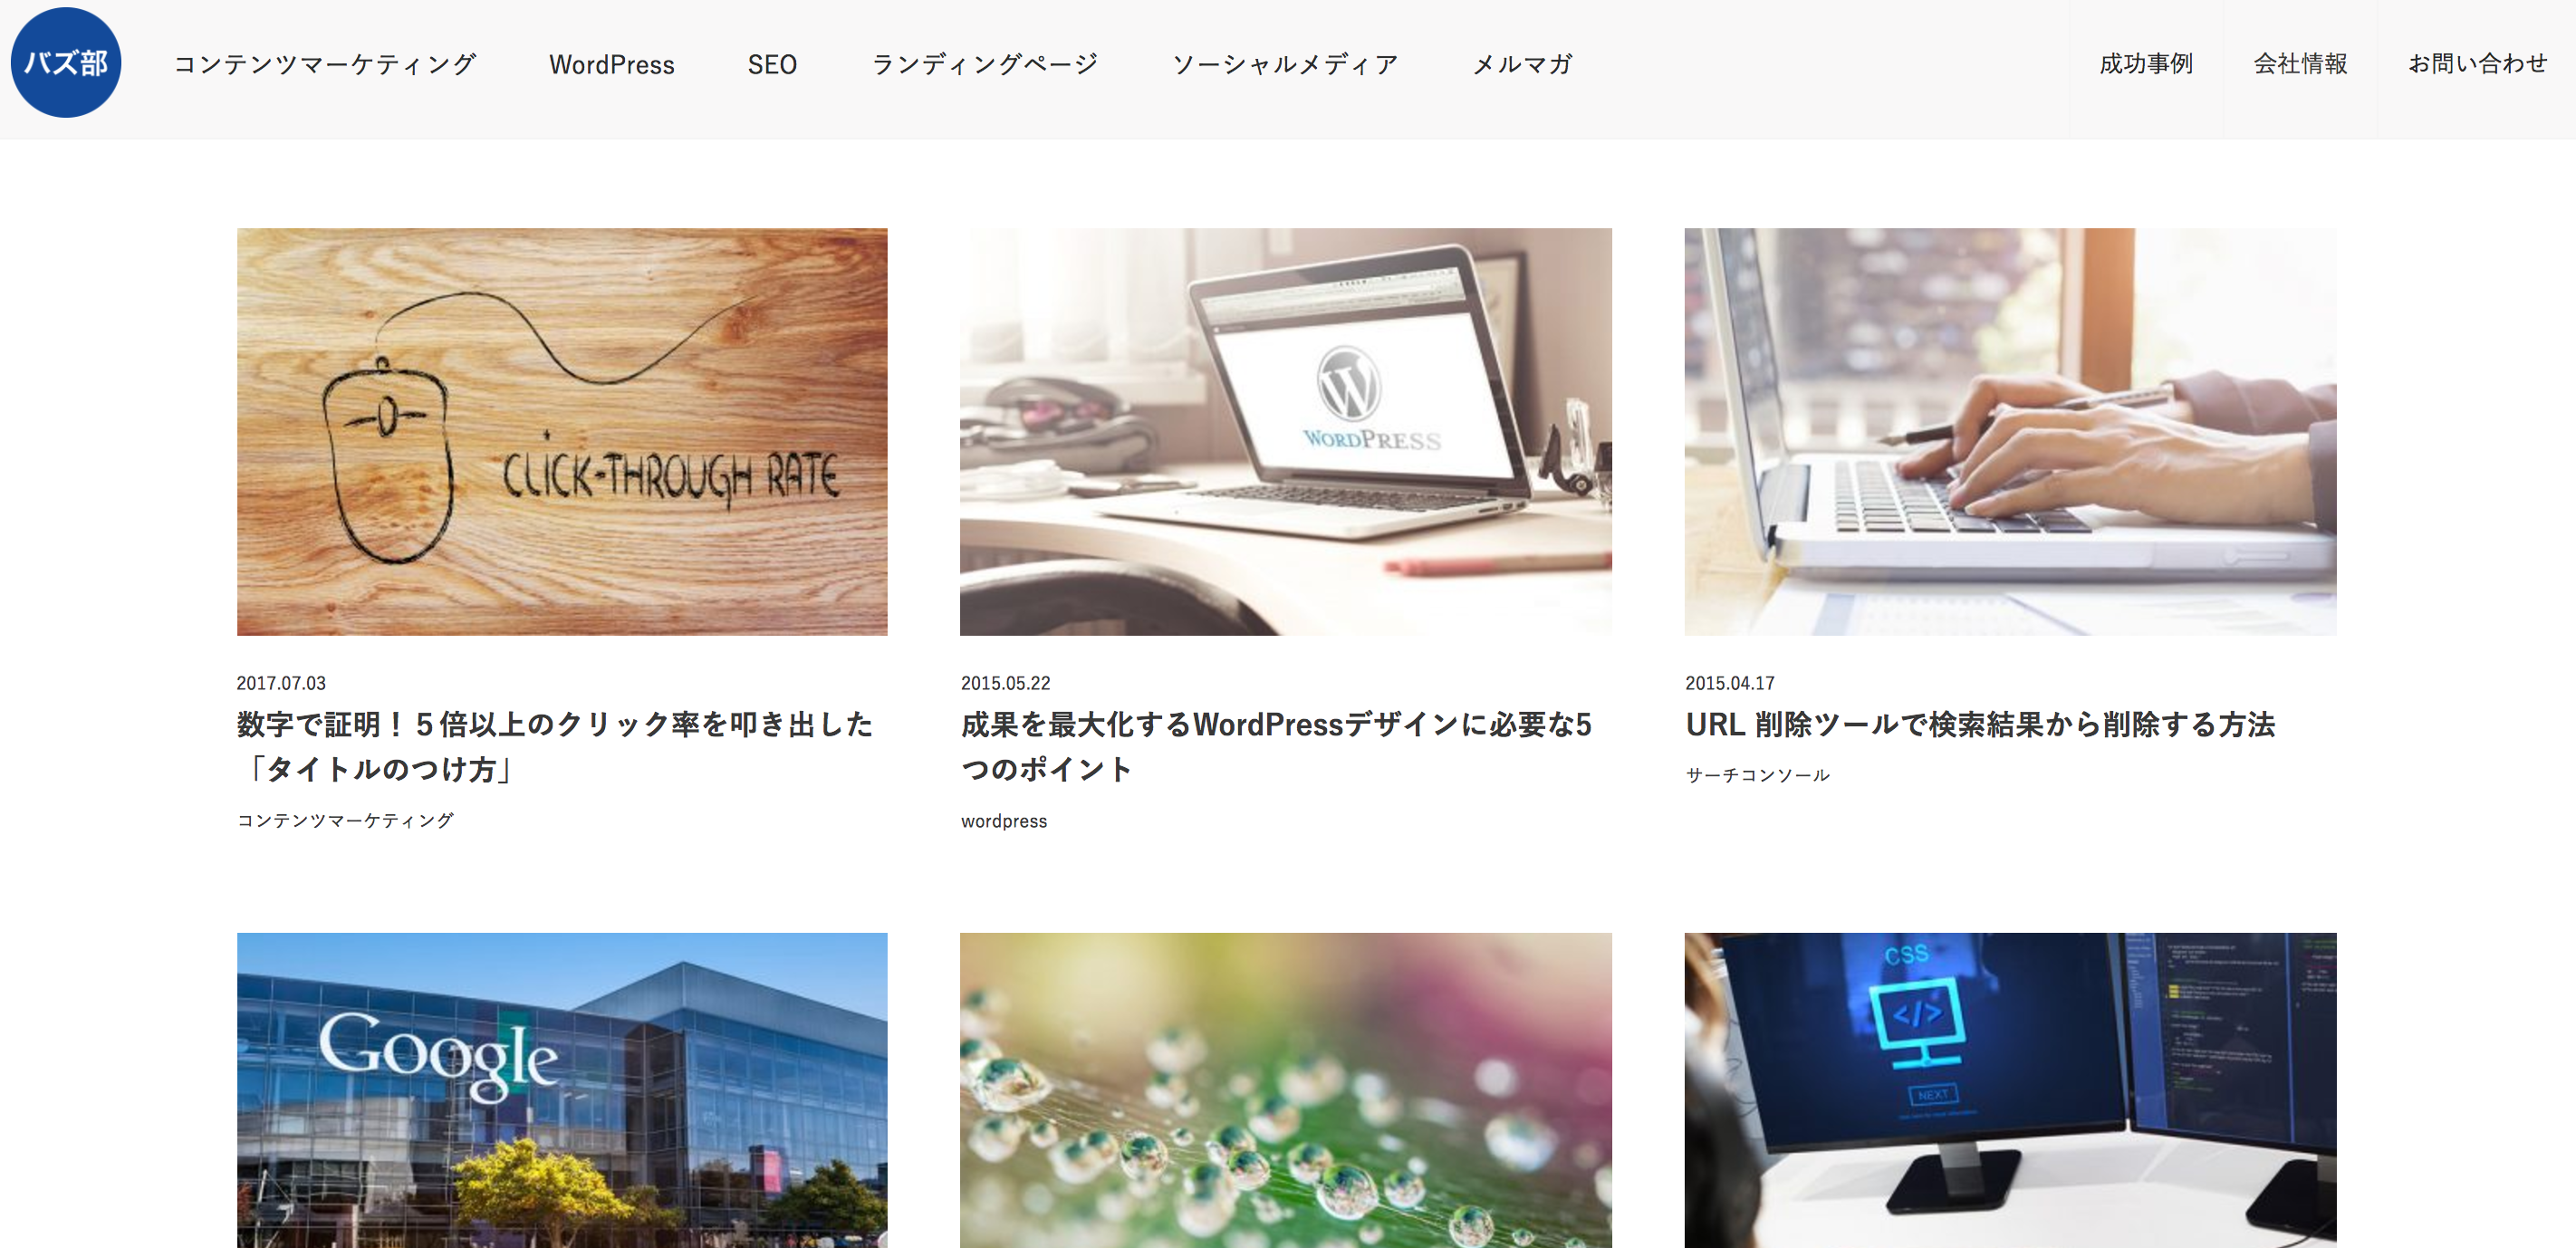 bazubu - WordPressの企業サイト事例8選!おすすめテーマとテーマの調べ方も紹介